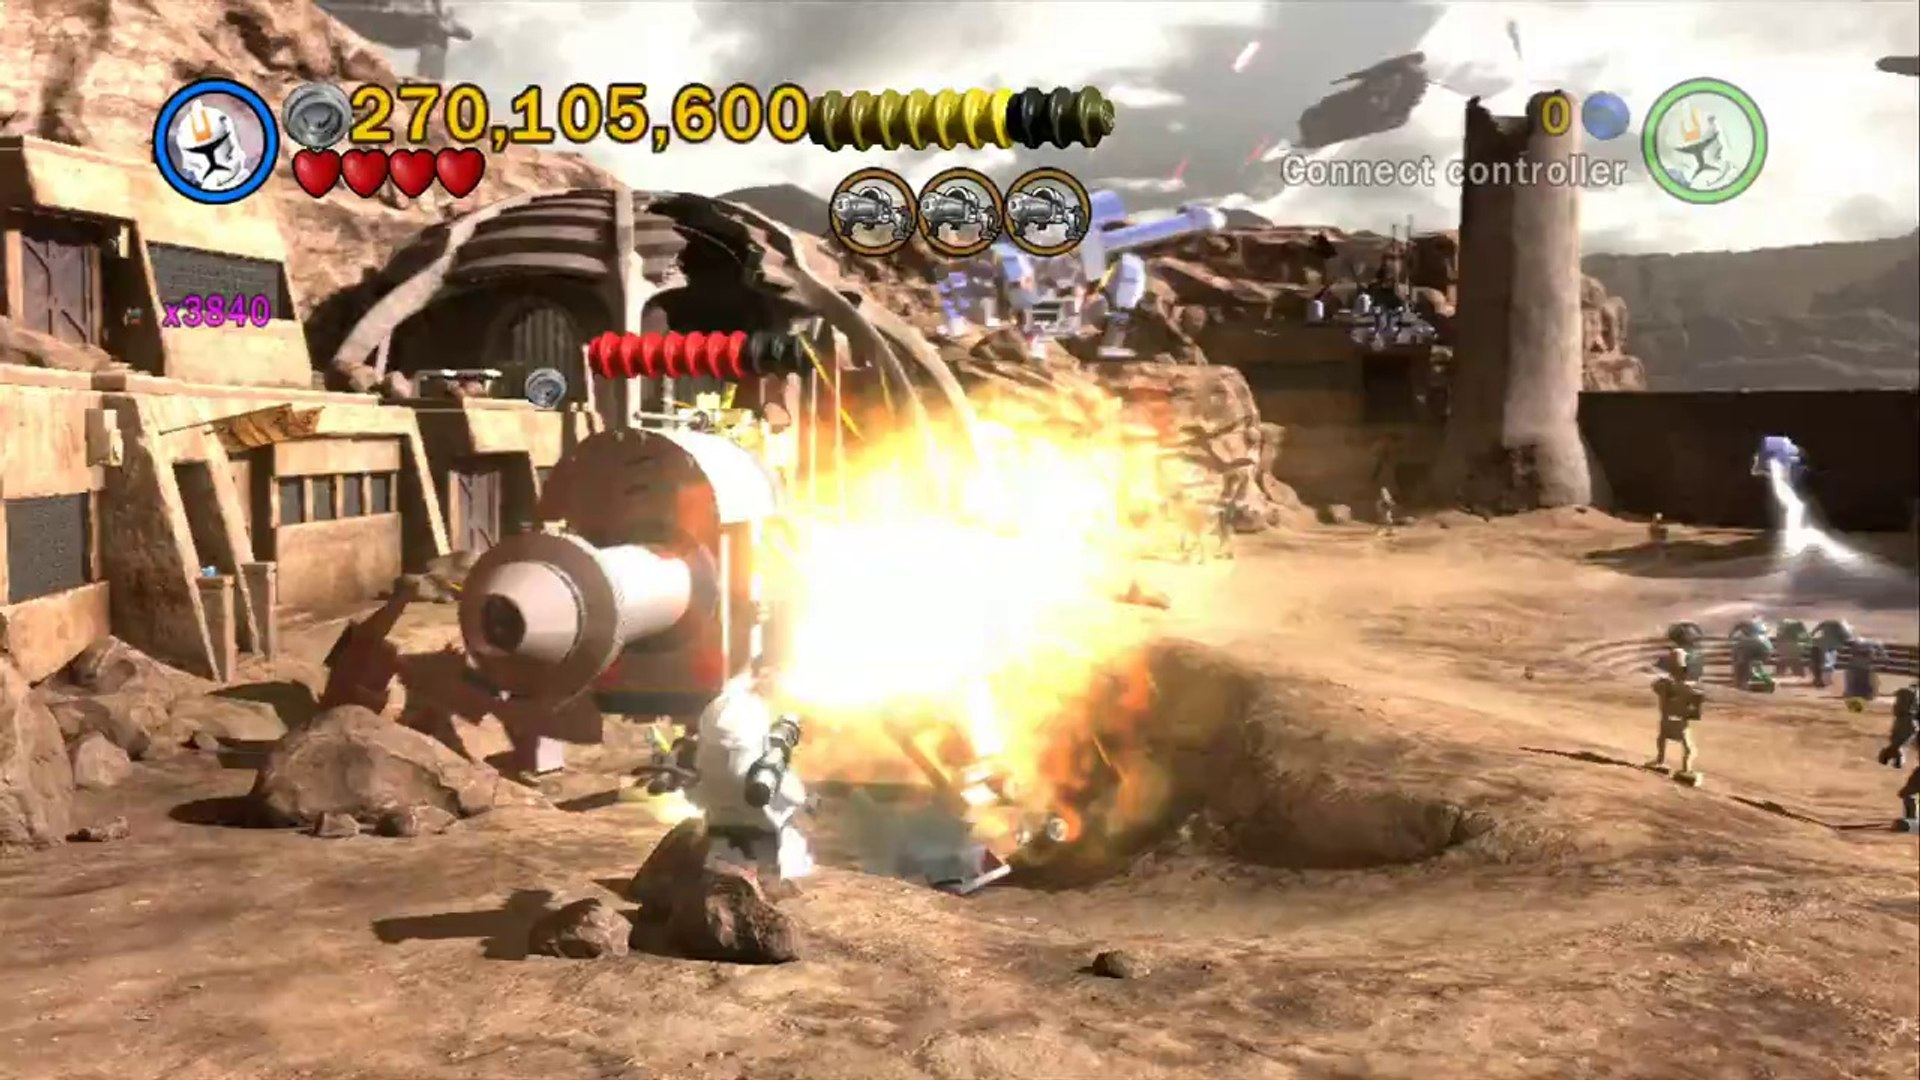 LEGO Star Wars III  The Clone Wars - 100% Guide #18 - Innocents of Ryloth (All Minikits)